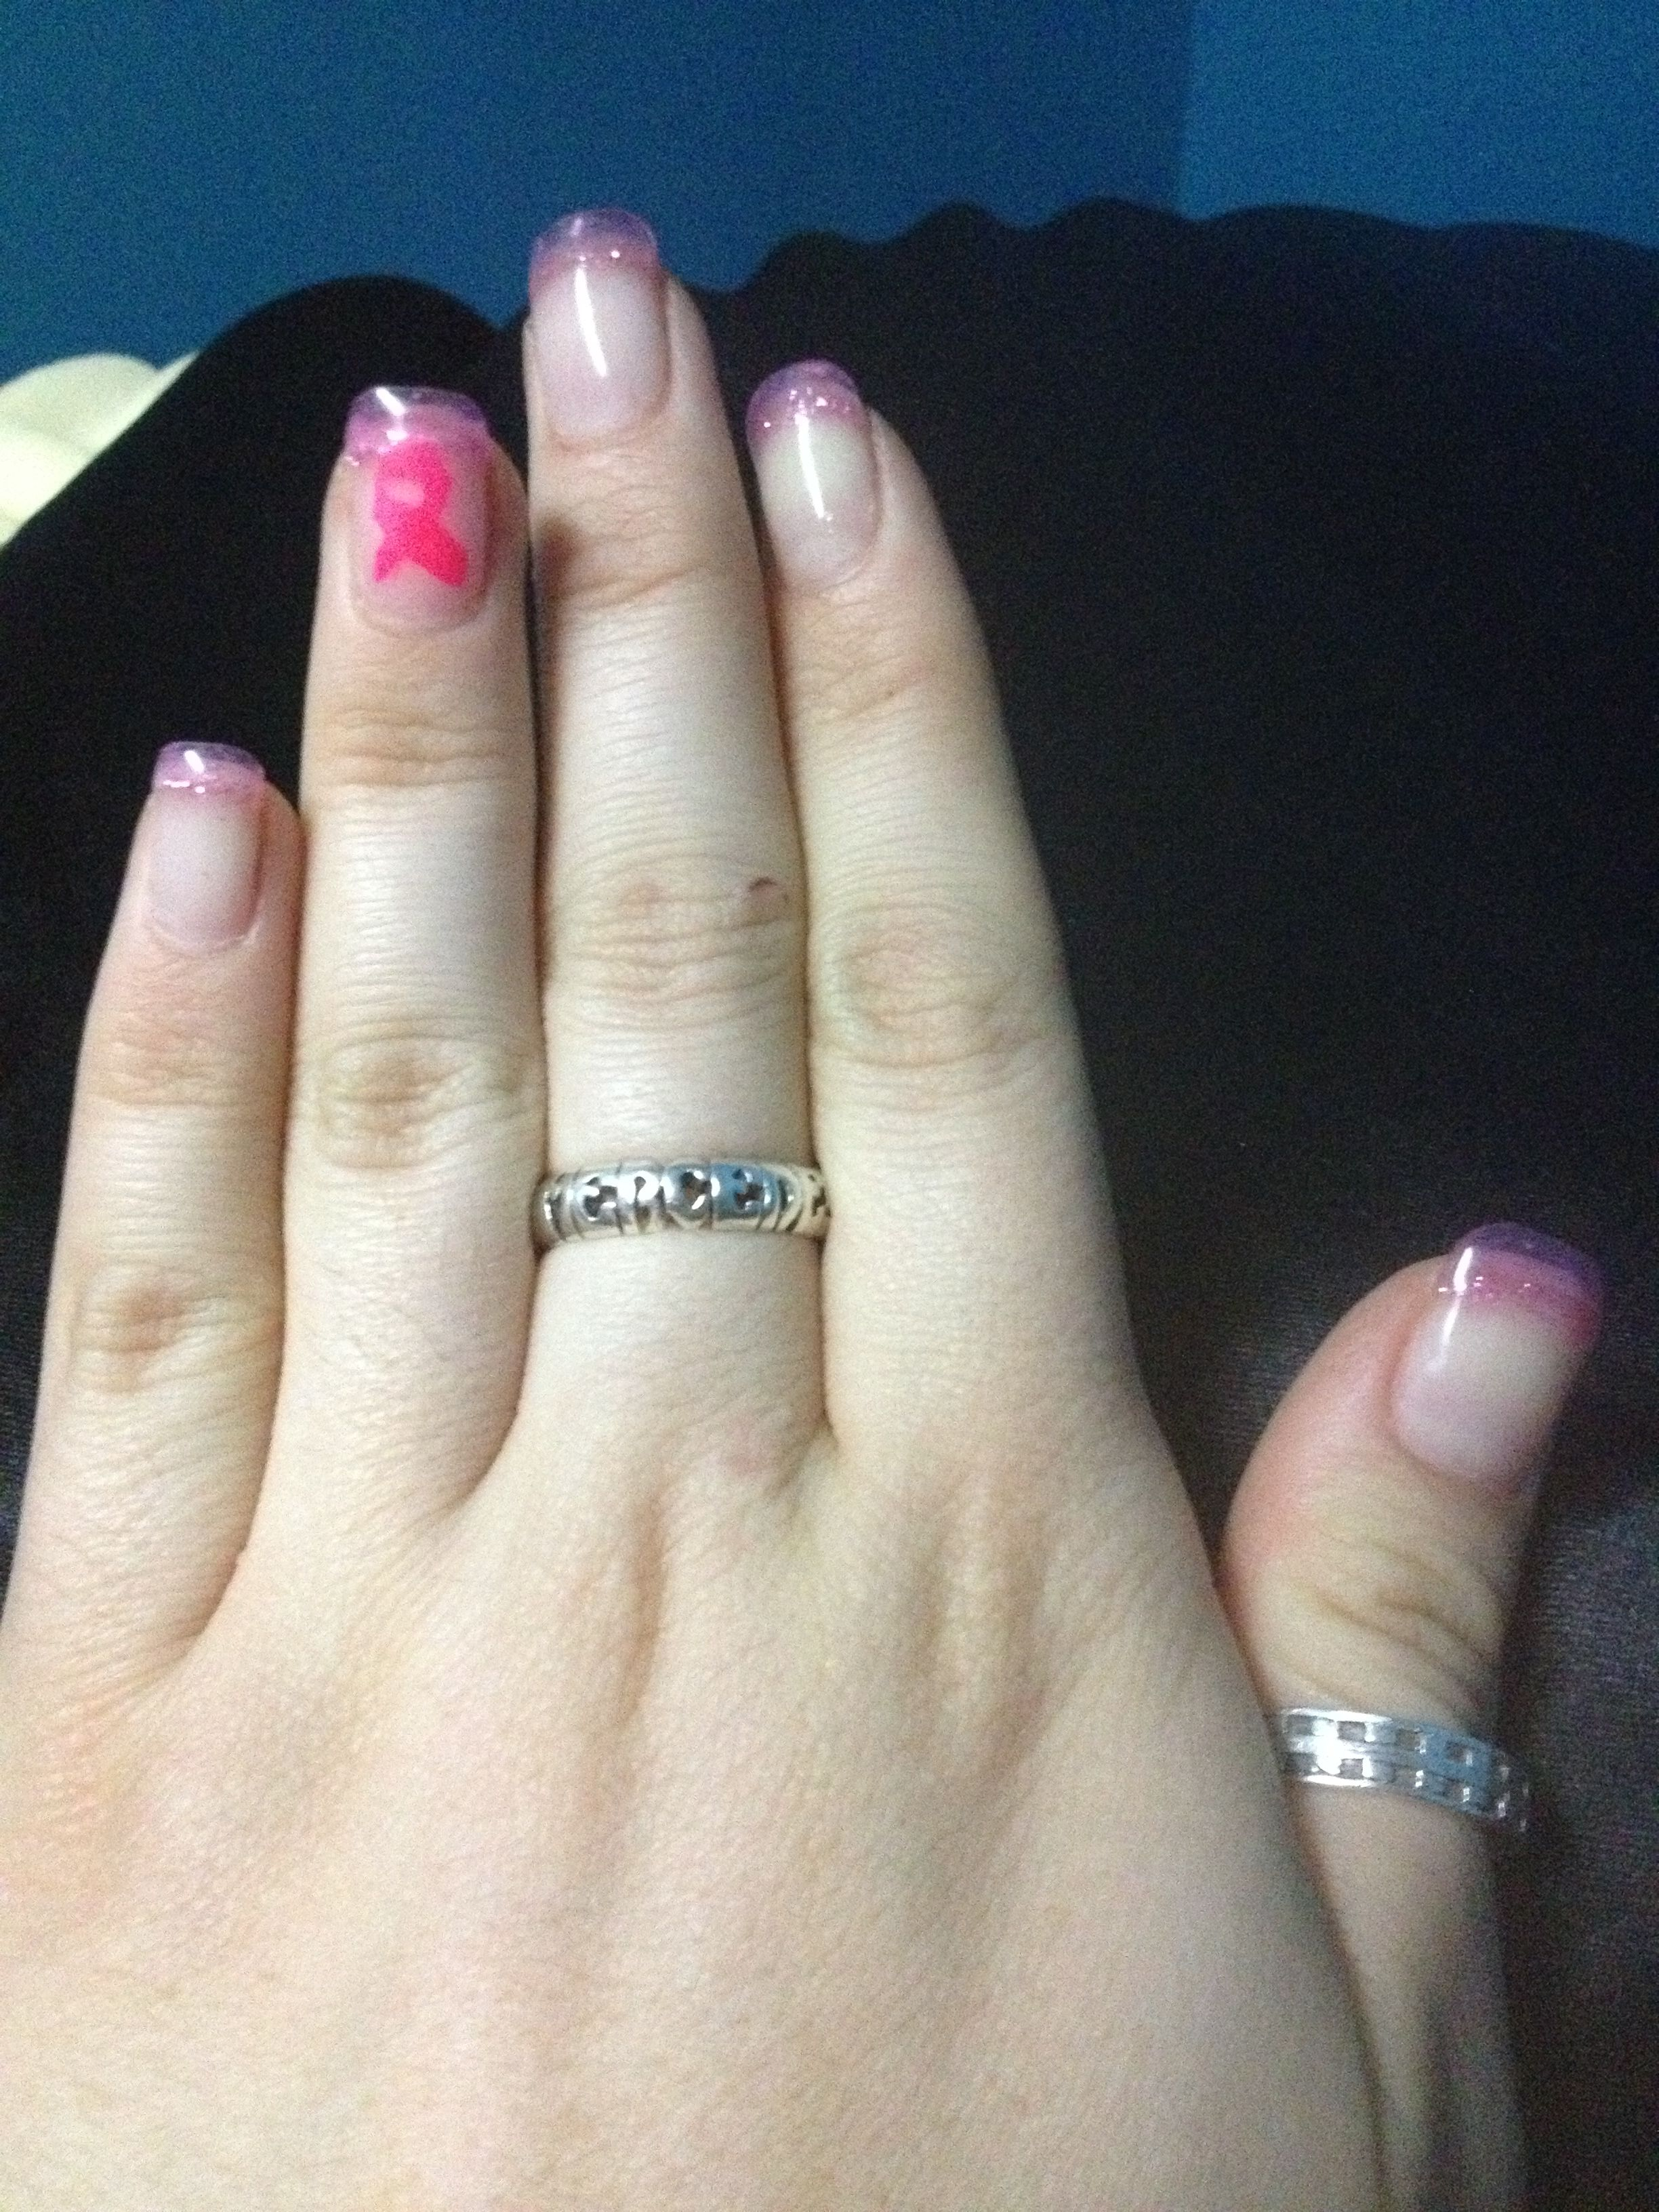 Bca month nails